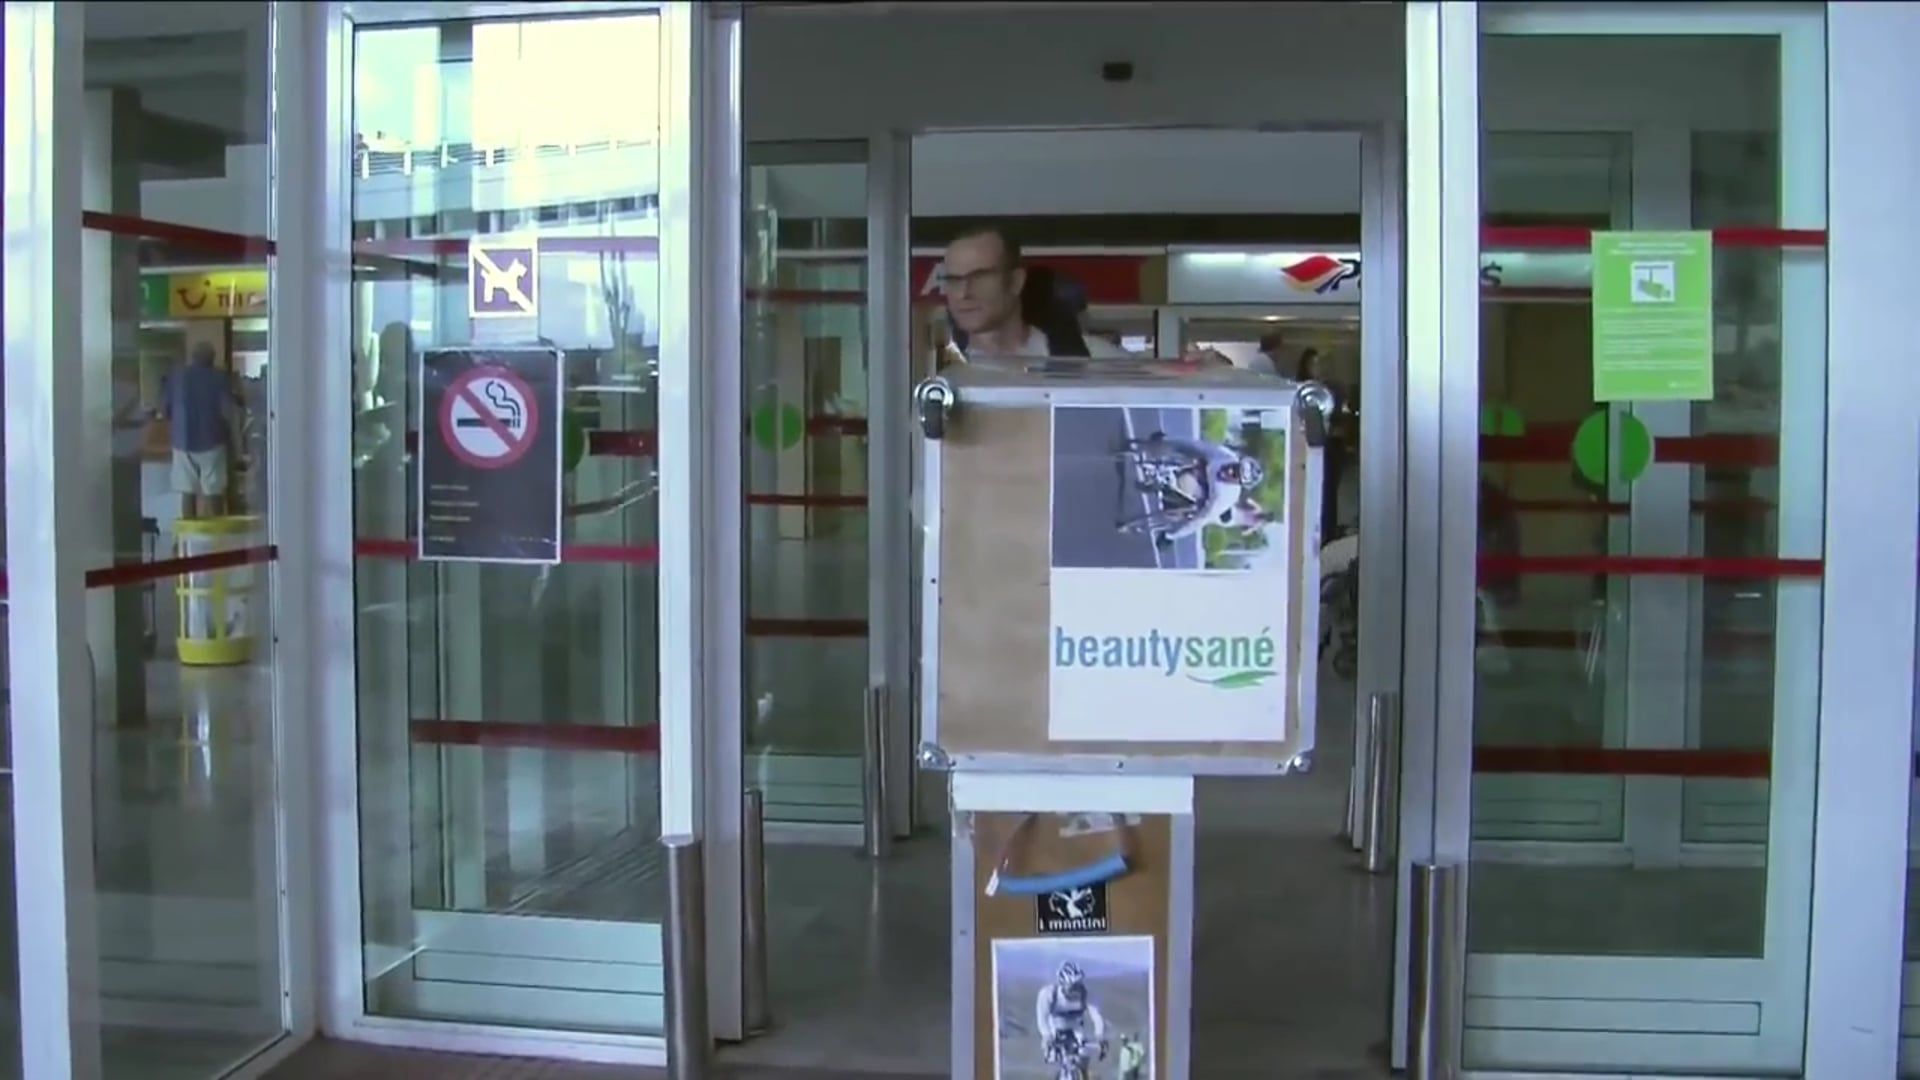 Dominique Benassi, La vie sur une Jambe